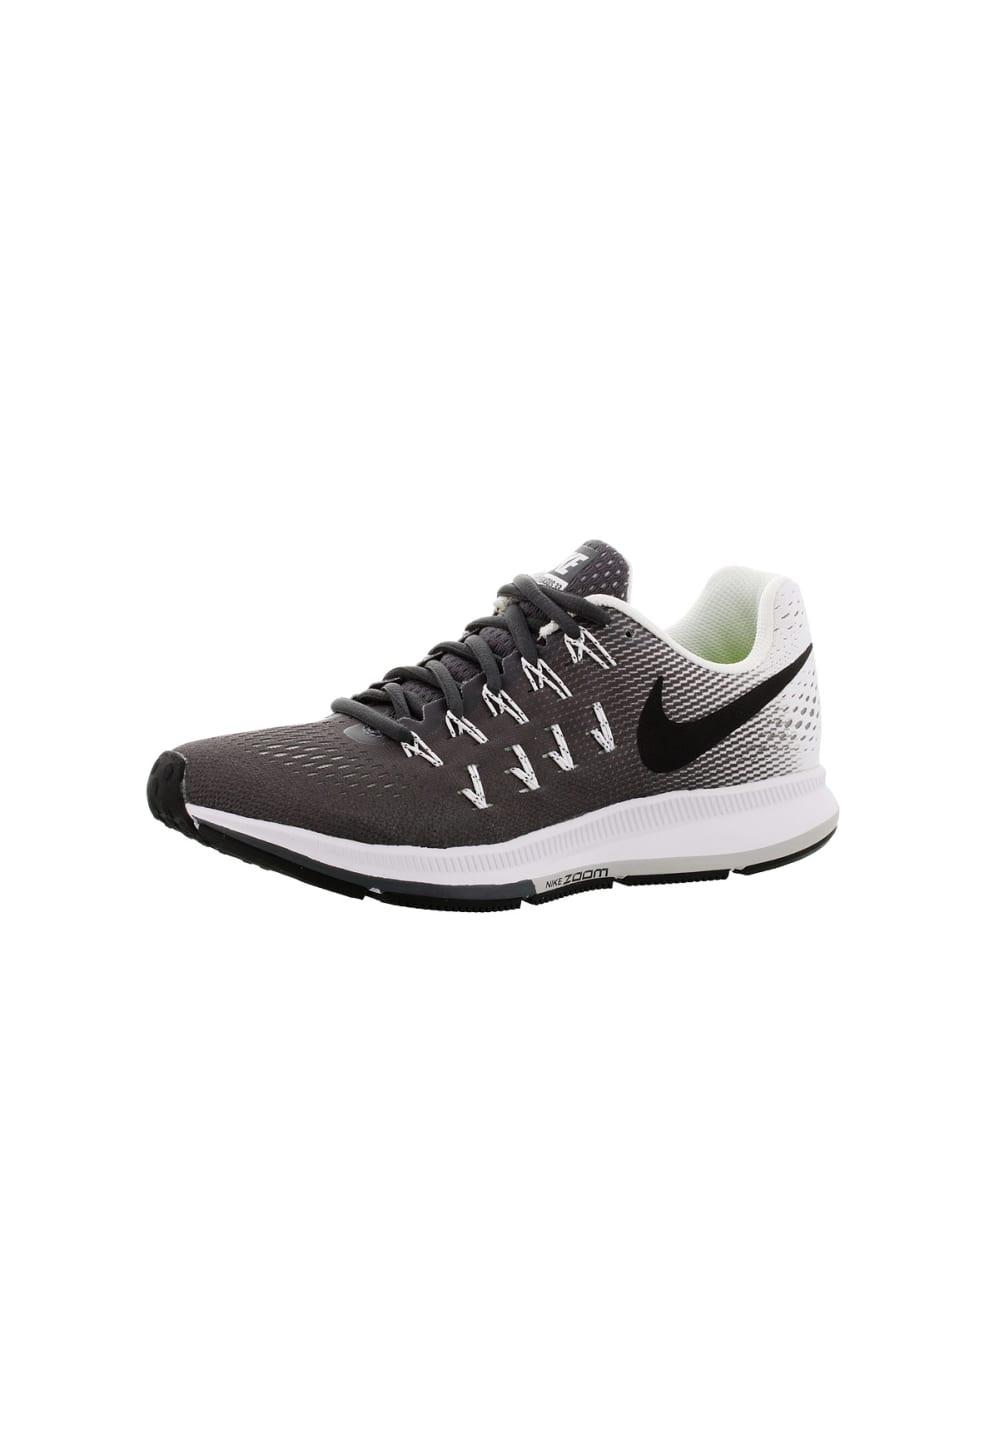 Nike Air Zoom Pegasus 33 - Zapatillas de running para Mujer - Gris ... 1d2c814b31232